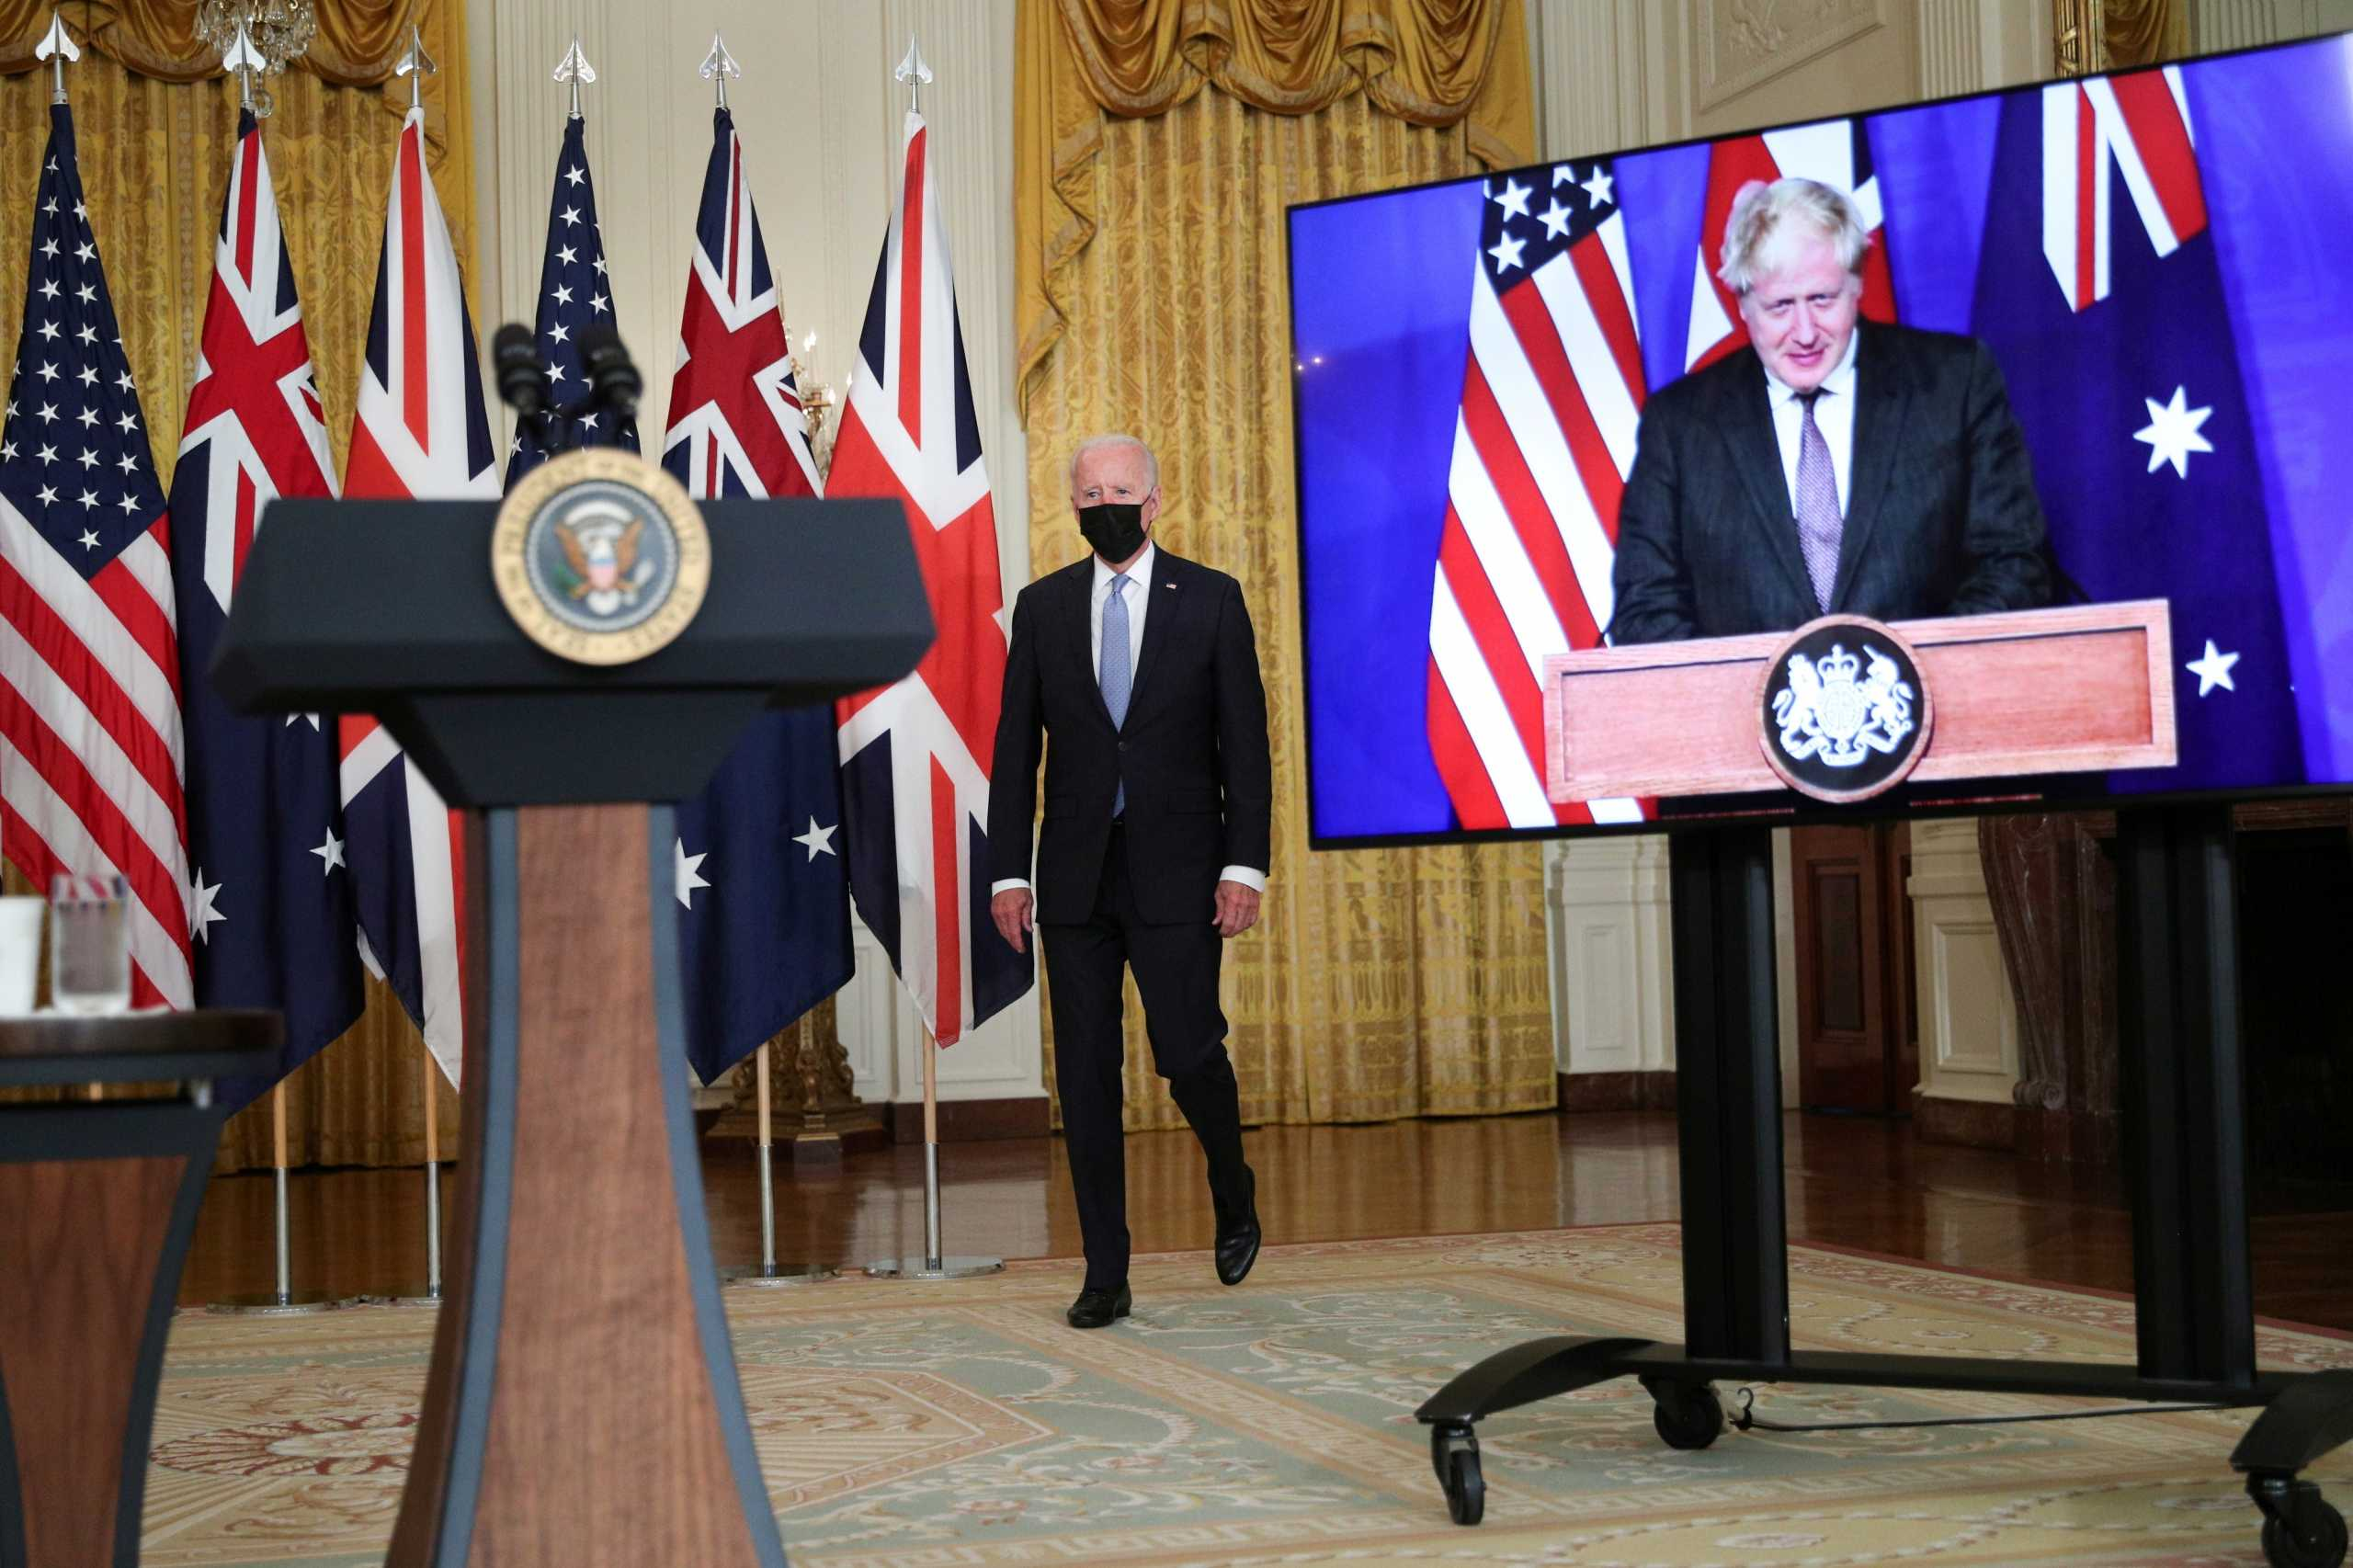 AUKUS: ΗΠΑ, Αυστραλία και Βρετανία είχαν συμφωνήσει τις λεπτομέρειες στην G7 πίσω από την πλάτη του Μακρόν